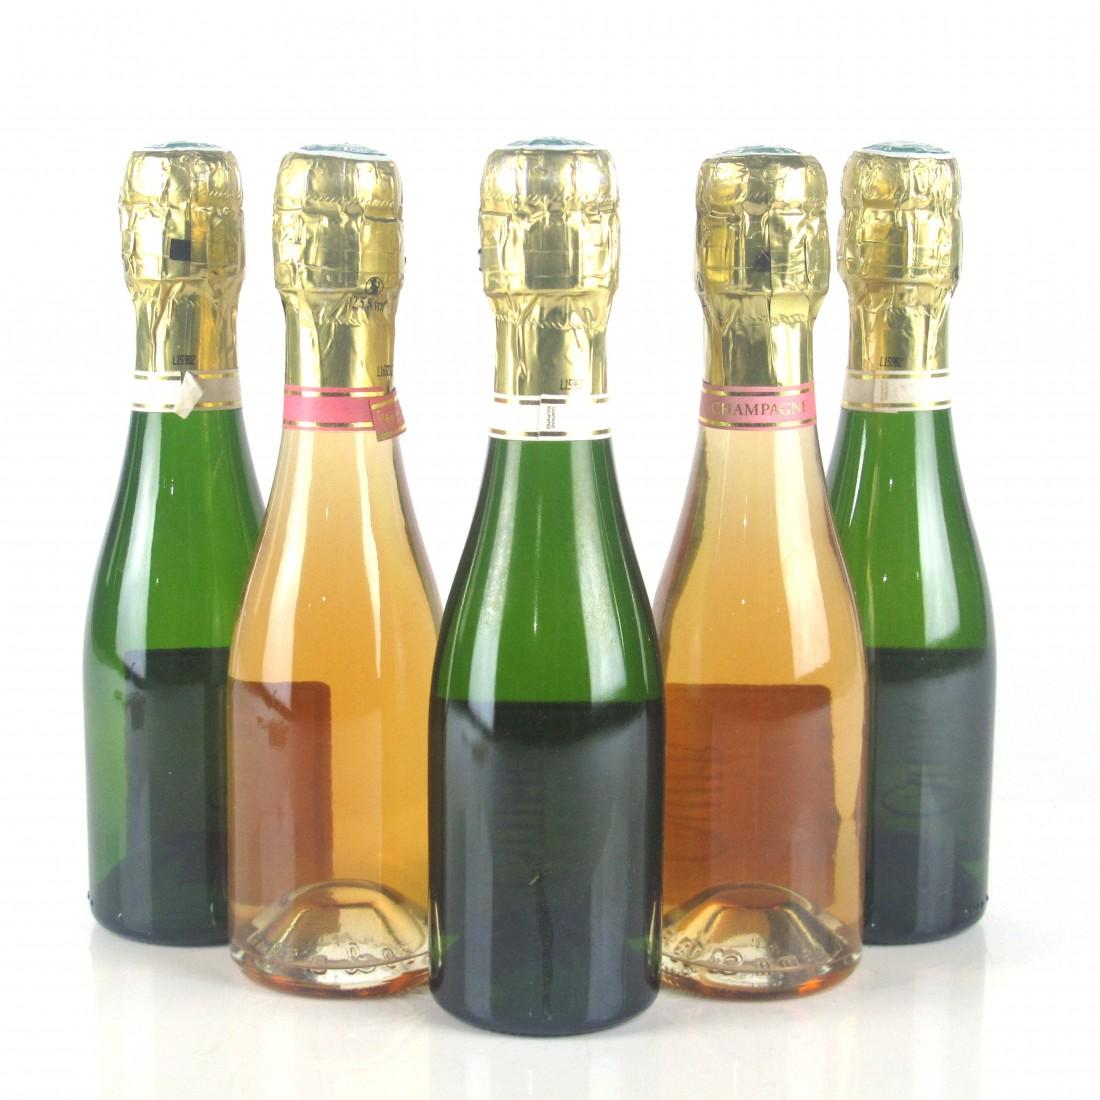 Cattier Brut & Rose NV Champagne 5x20cl